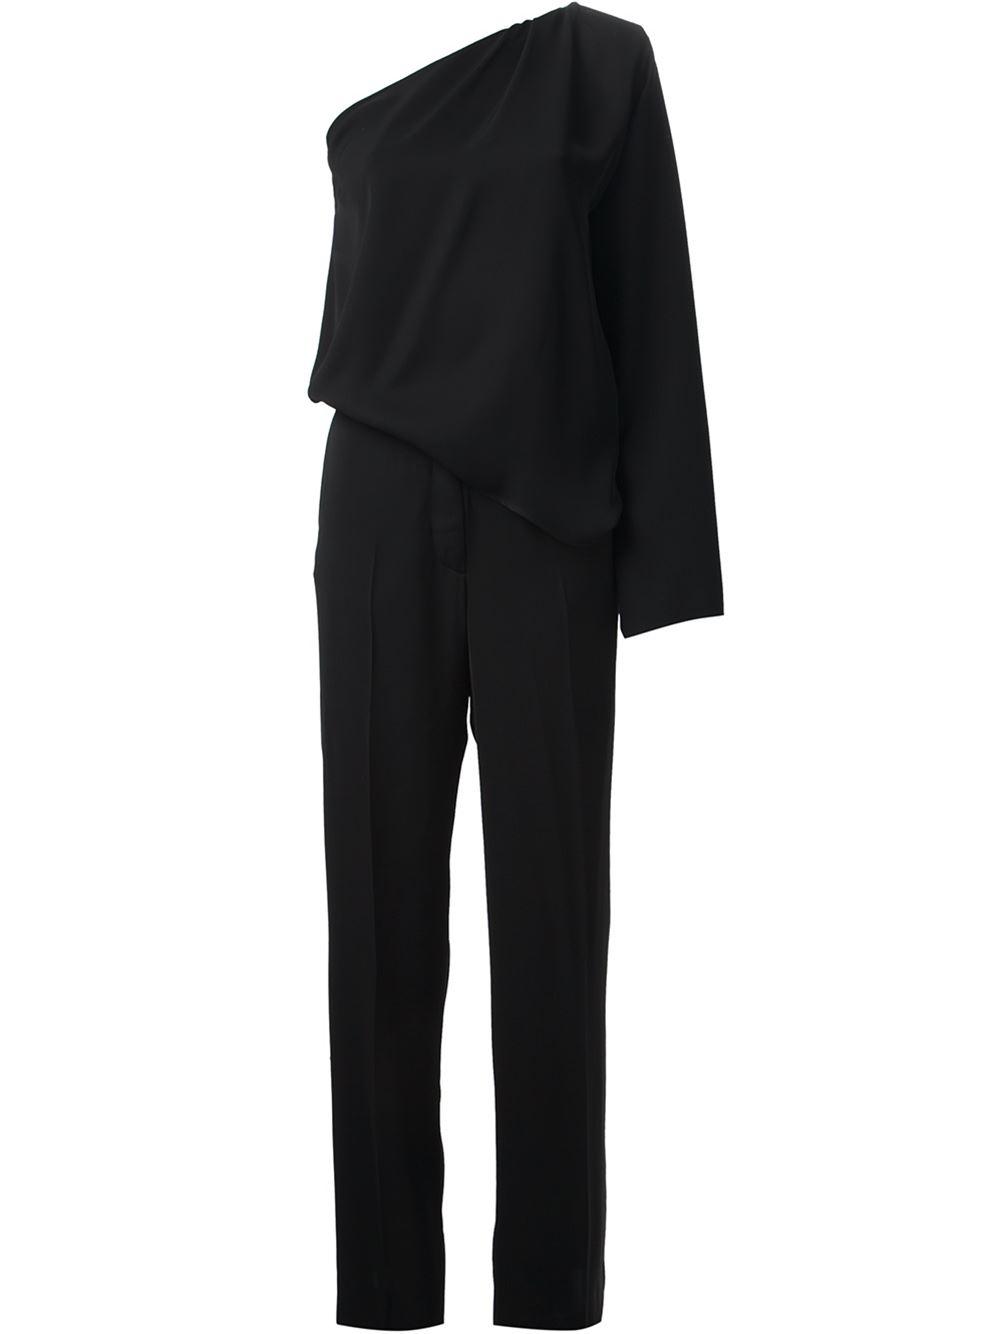 Maison martin margiela asymmetrical jumpsuit